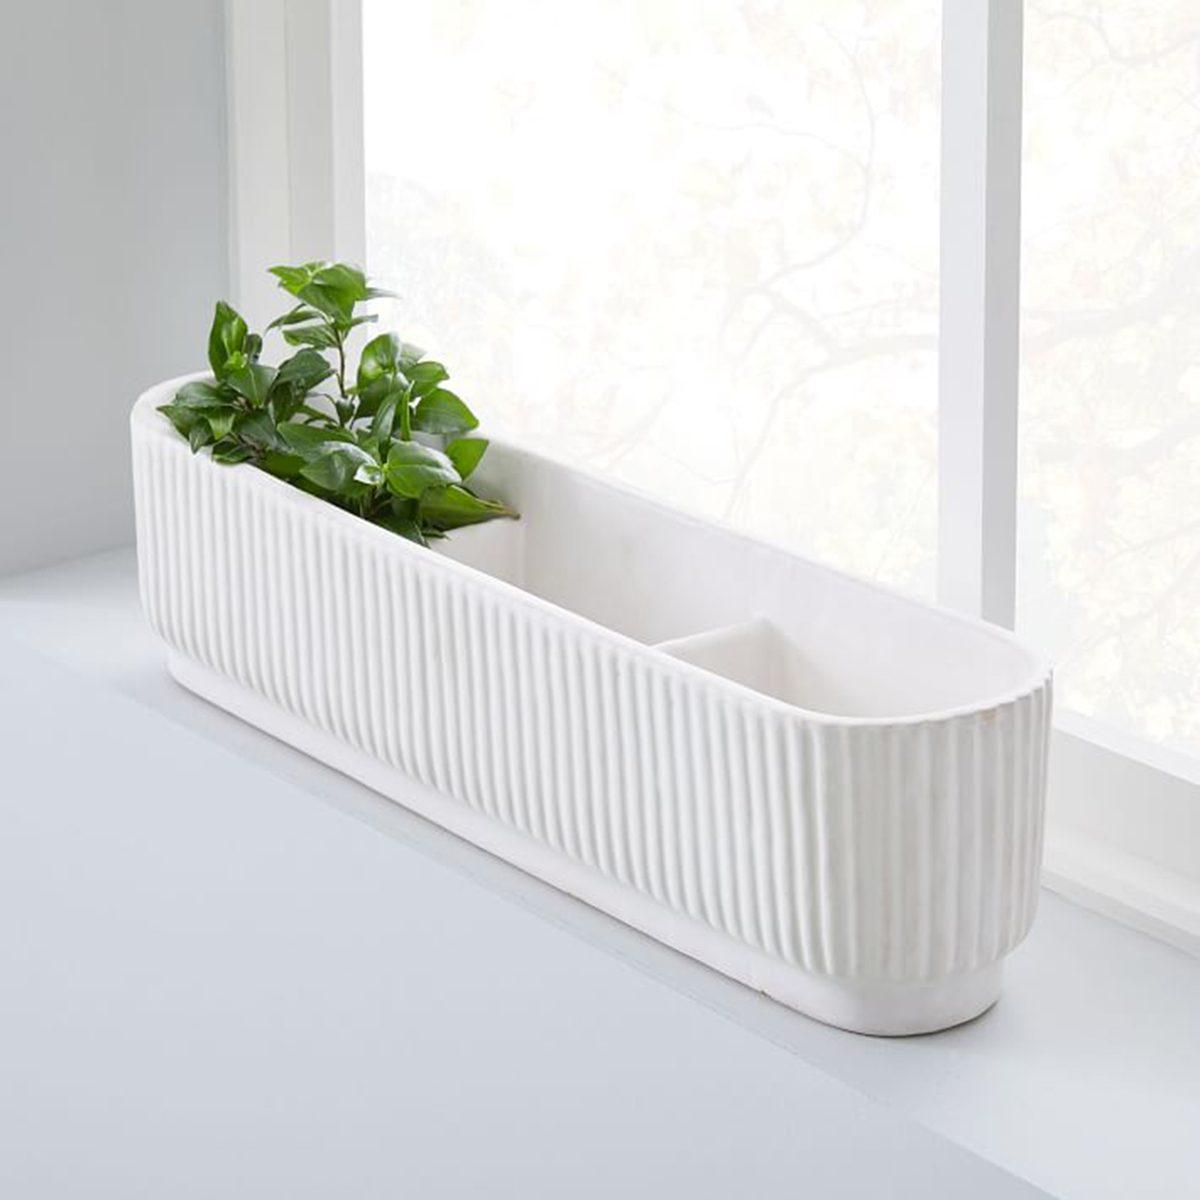 Fluted Windowsill Planter - White